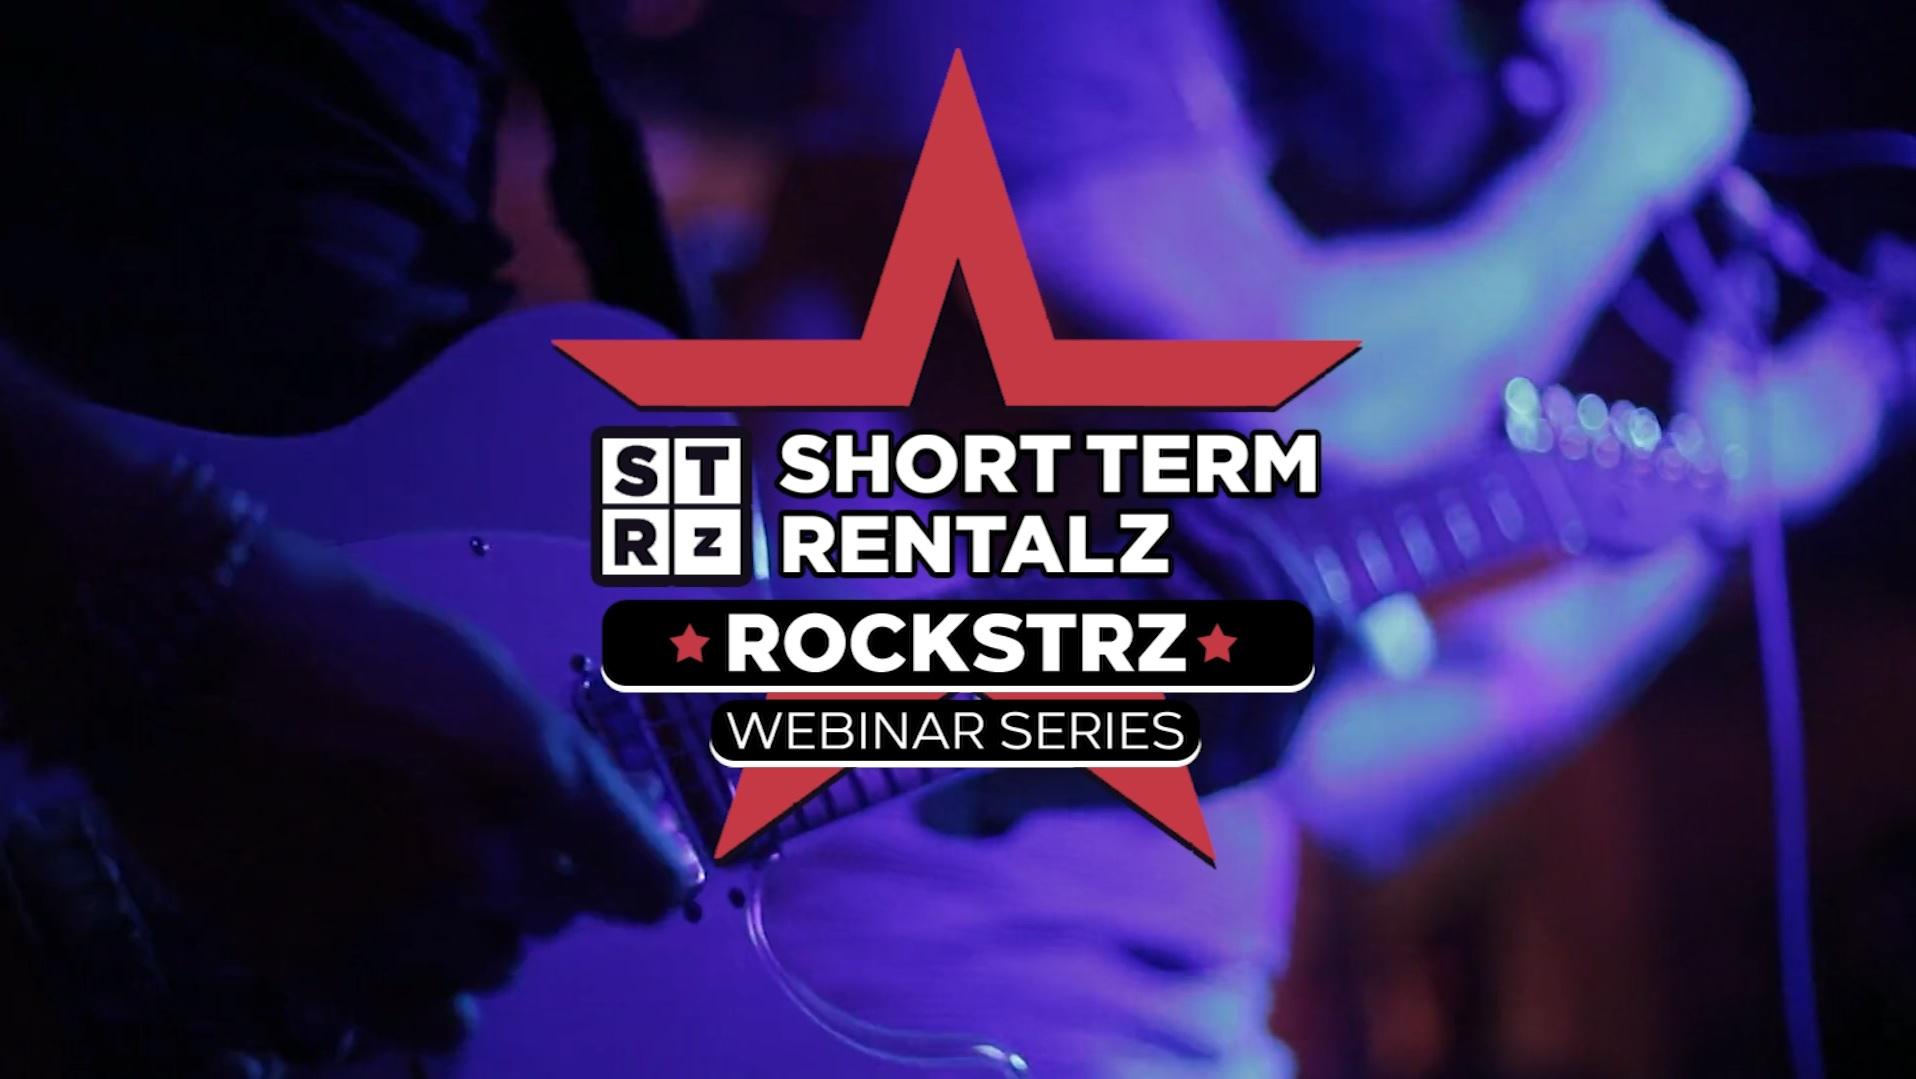 RockSTRz